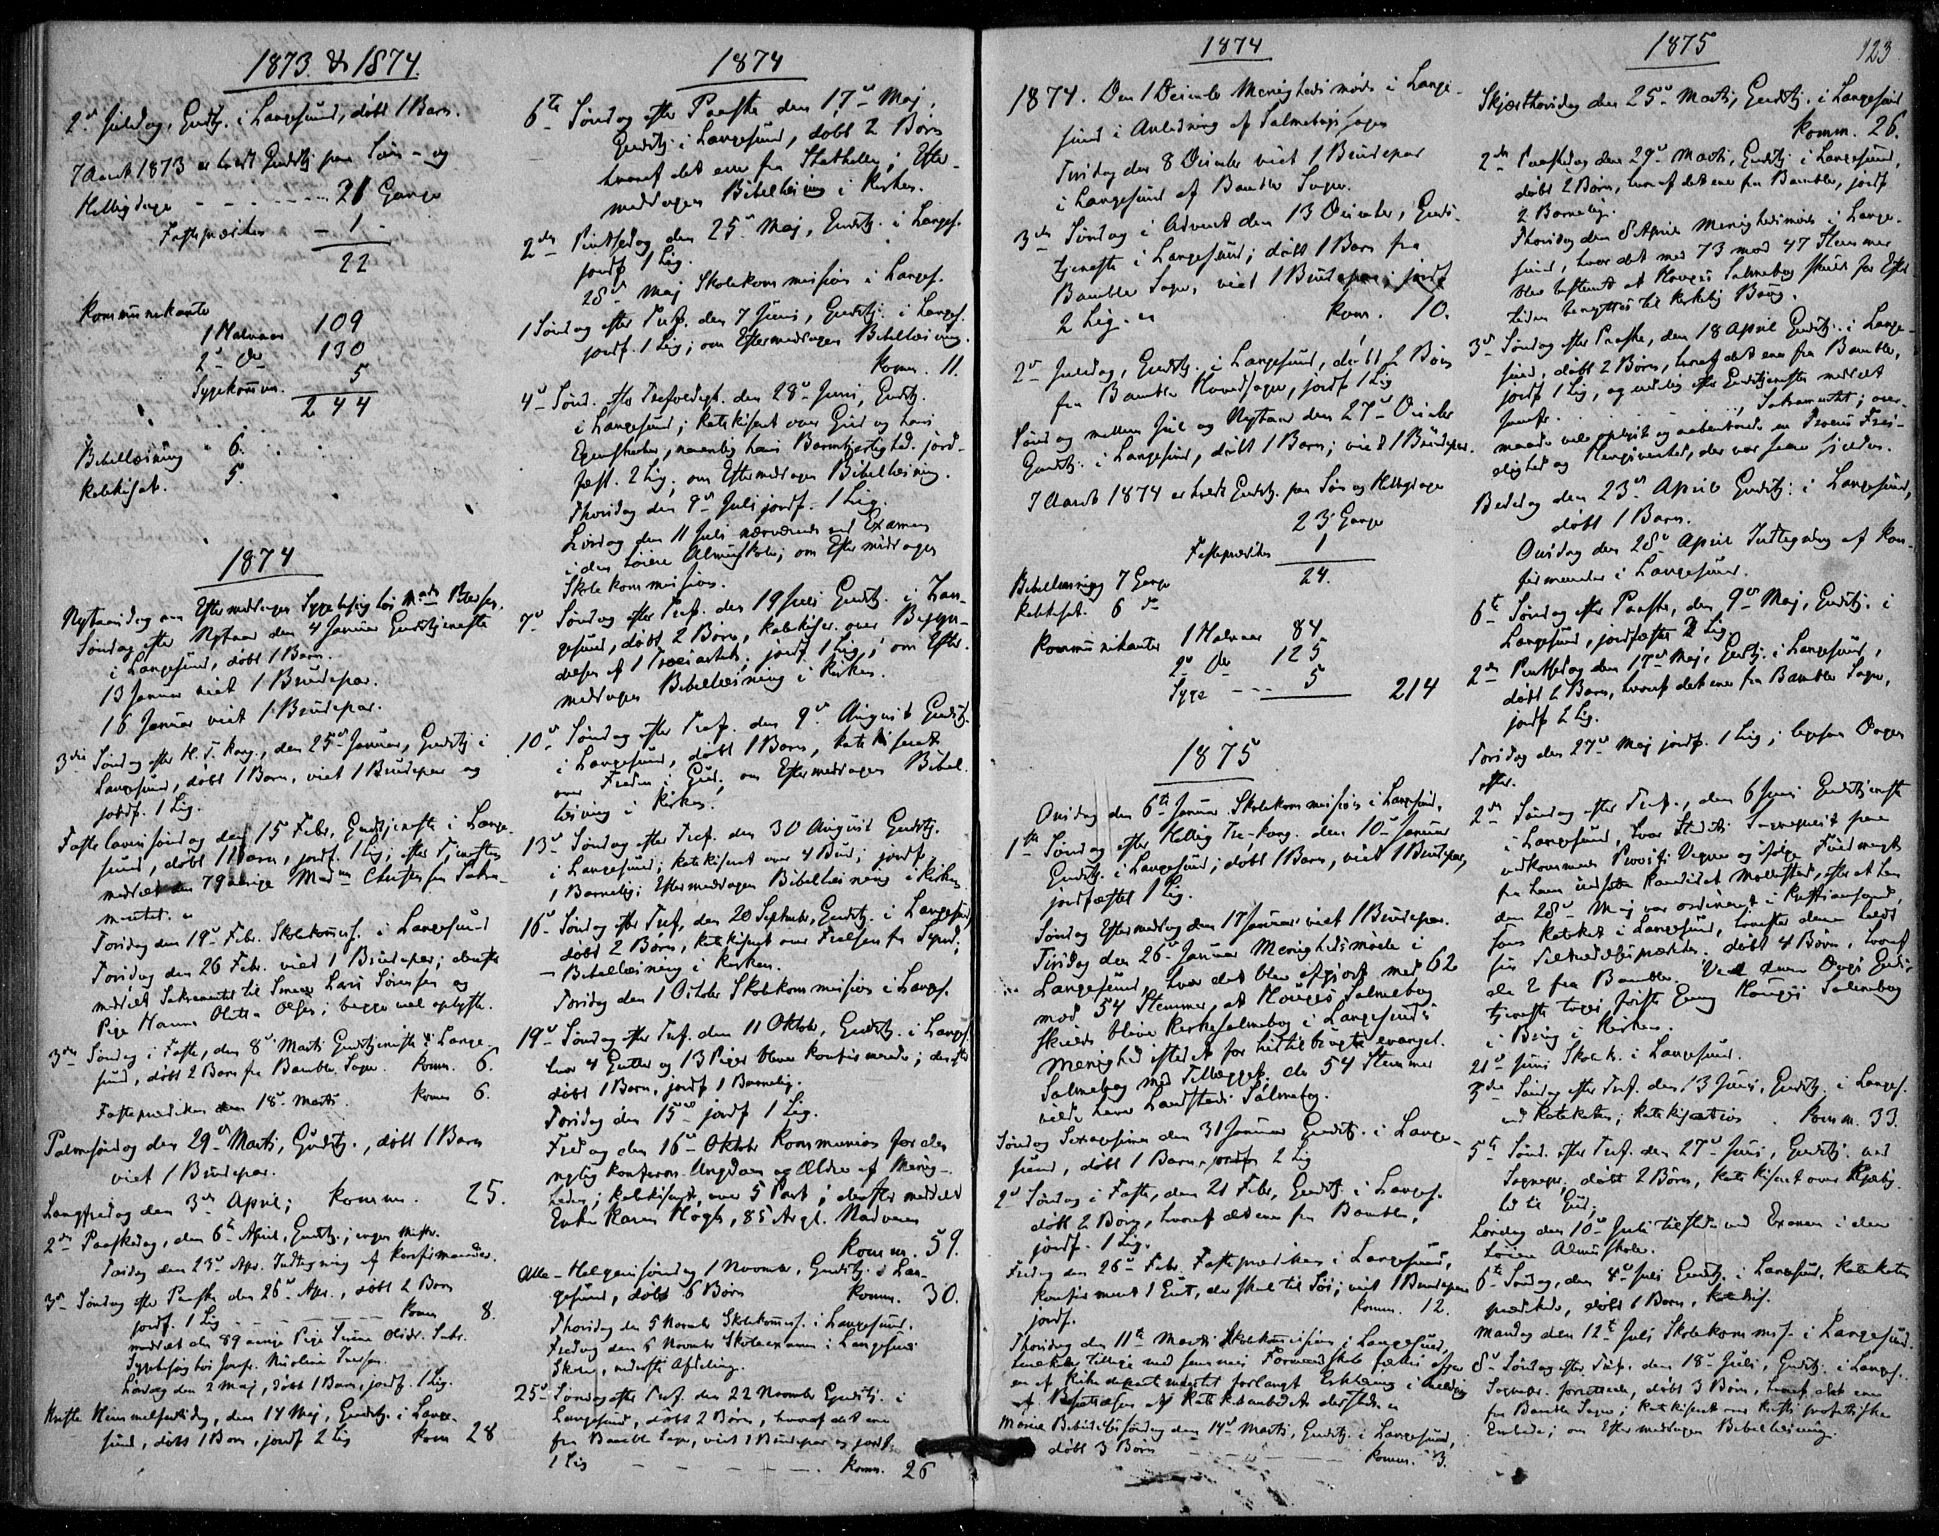 SAKO, Langesund kirkebøker, F/Fa/L0001: Ministerialbok nr. 1, 1870-1877, s. 123